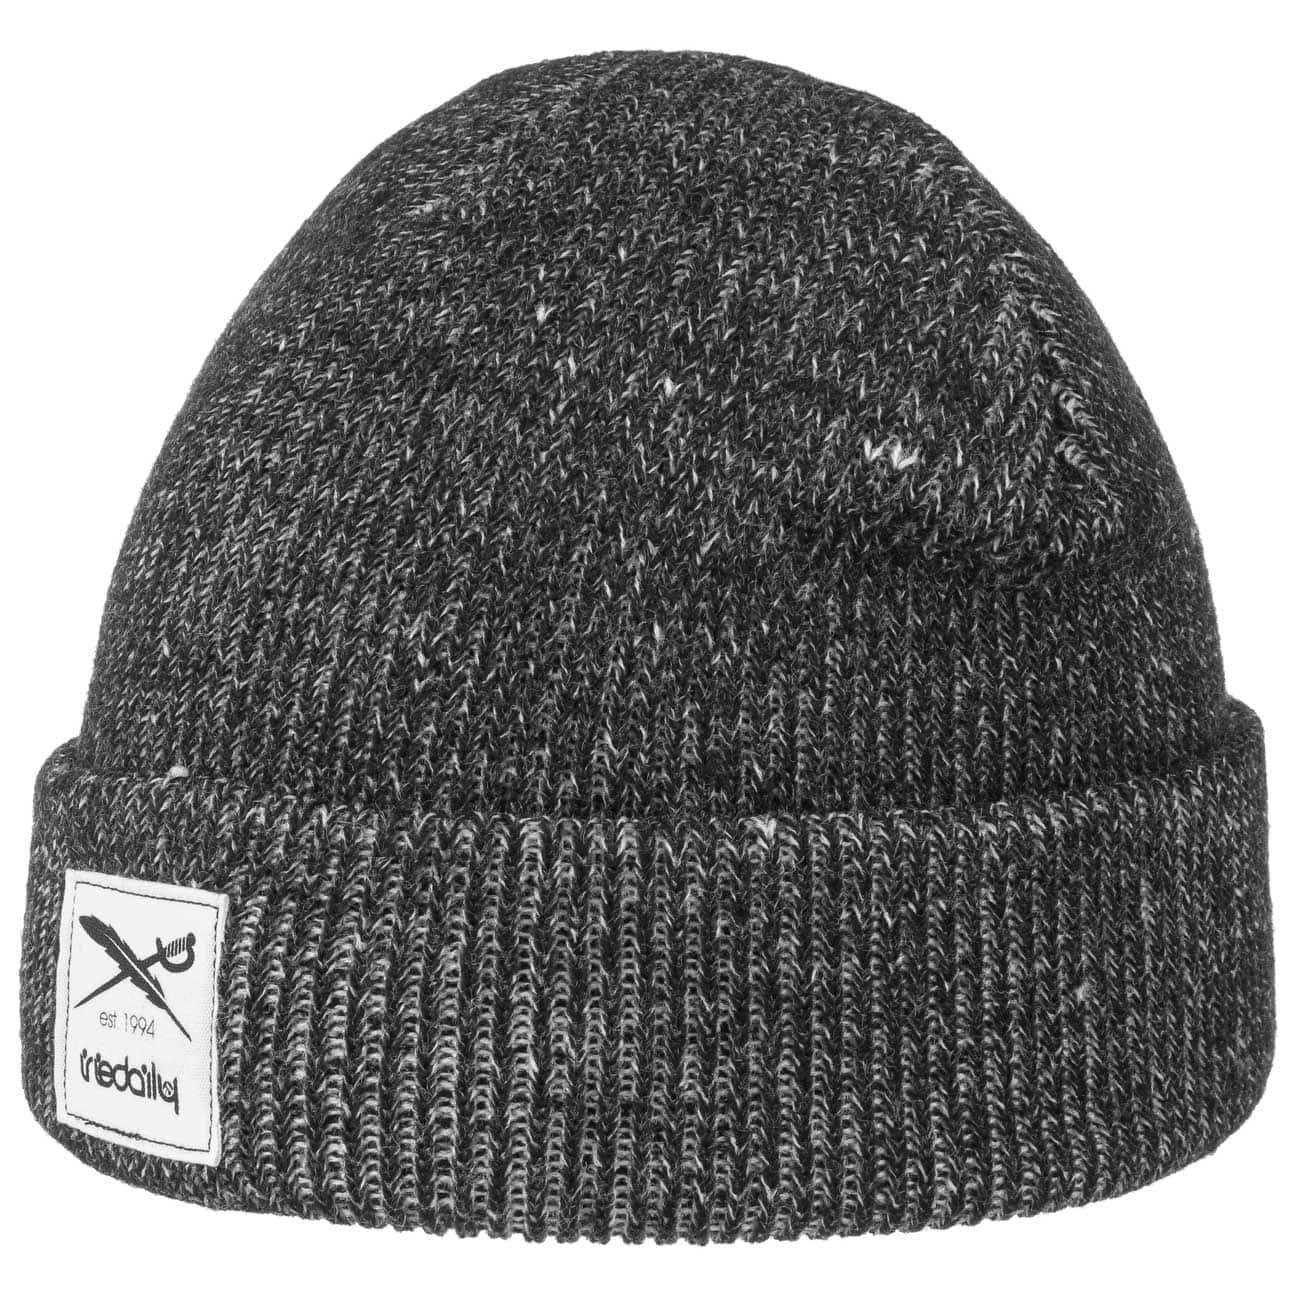 Bonnet Beanie Smurpher by iriedaily  bonnet à revers